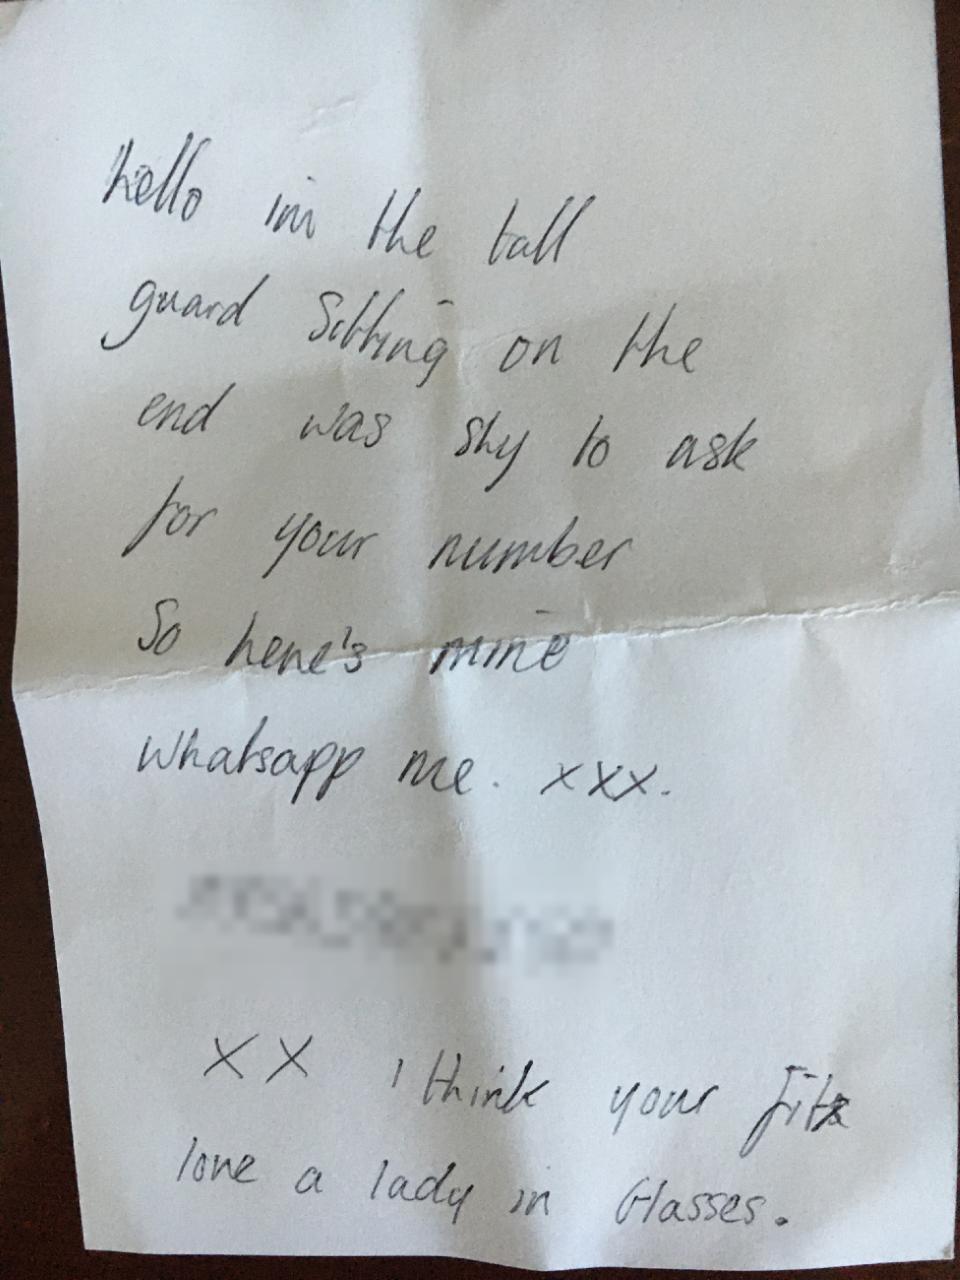 the note sent to Caroline